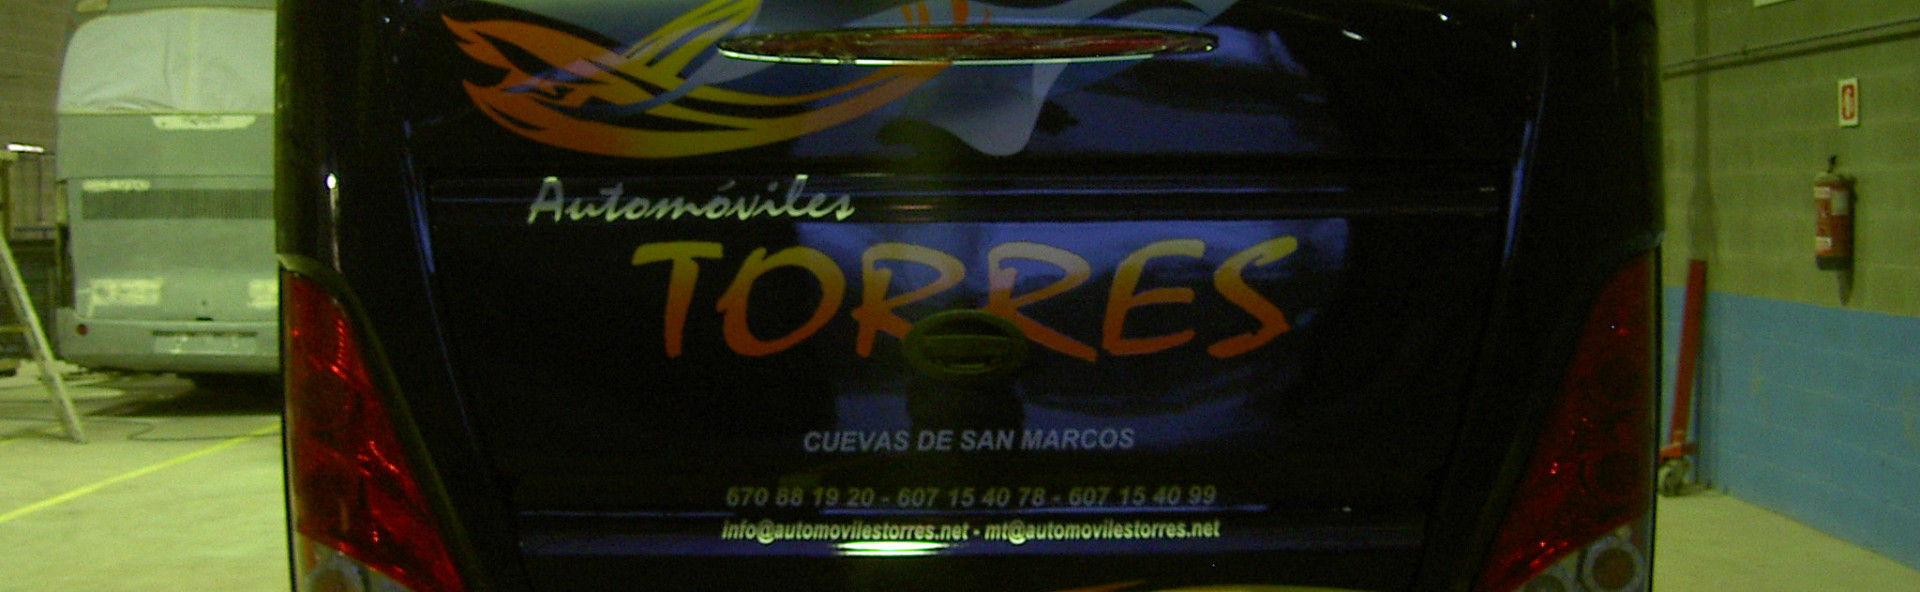 autobus de torres 001